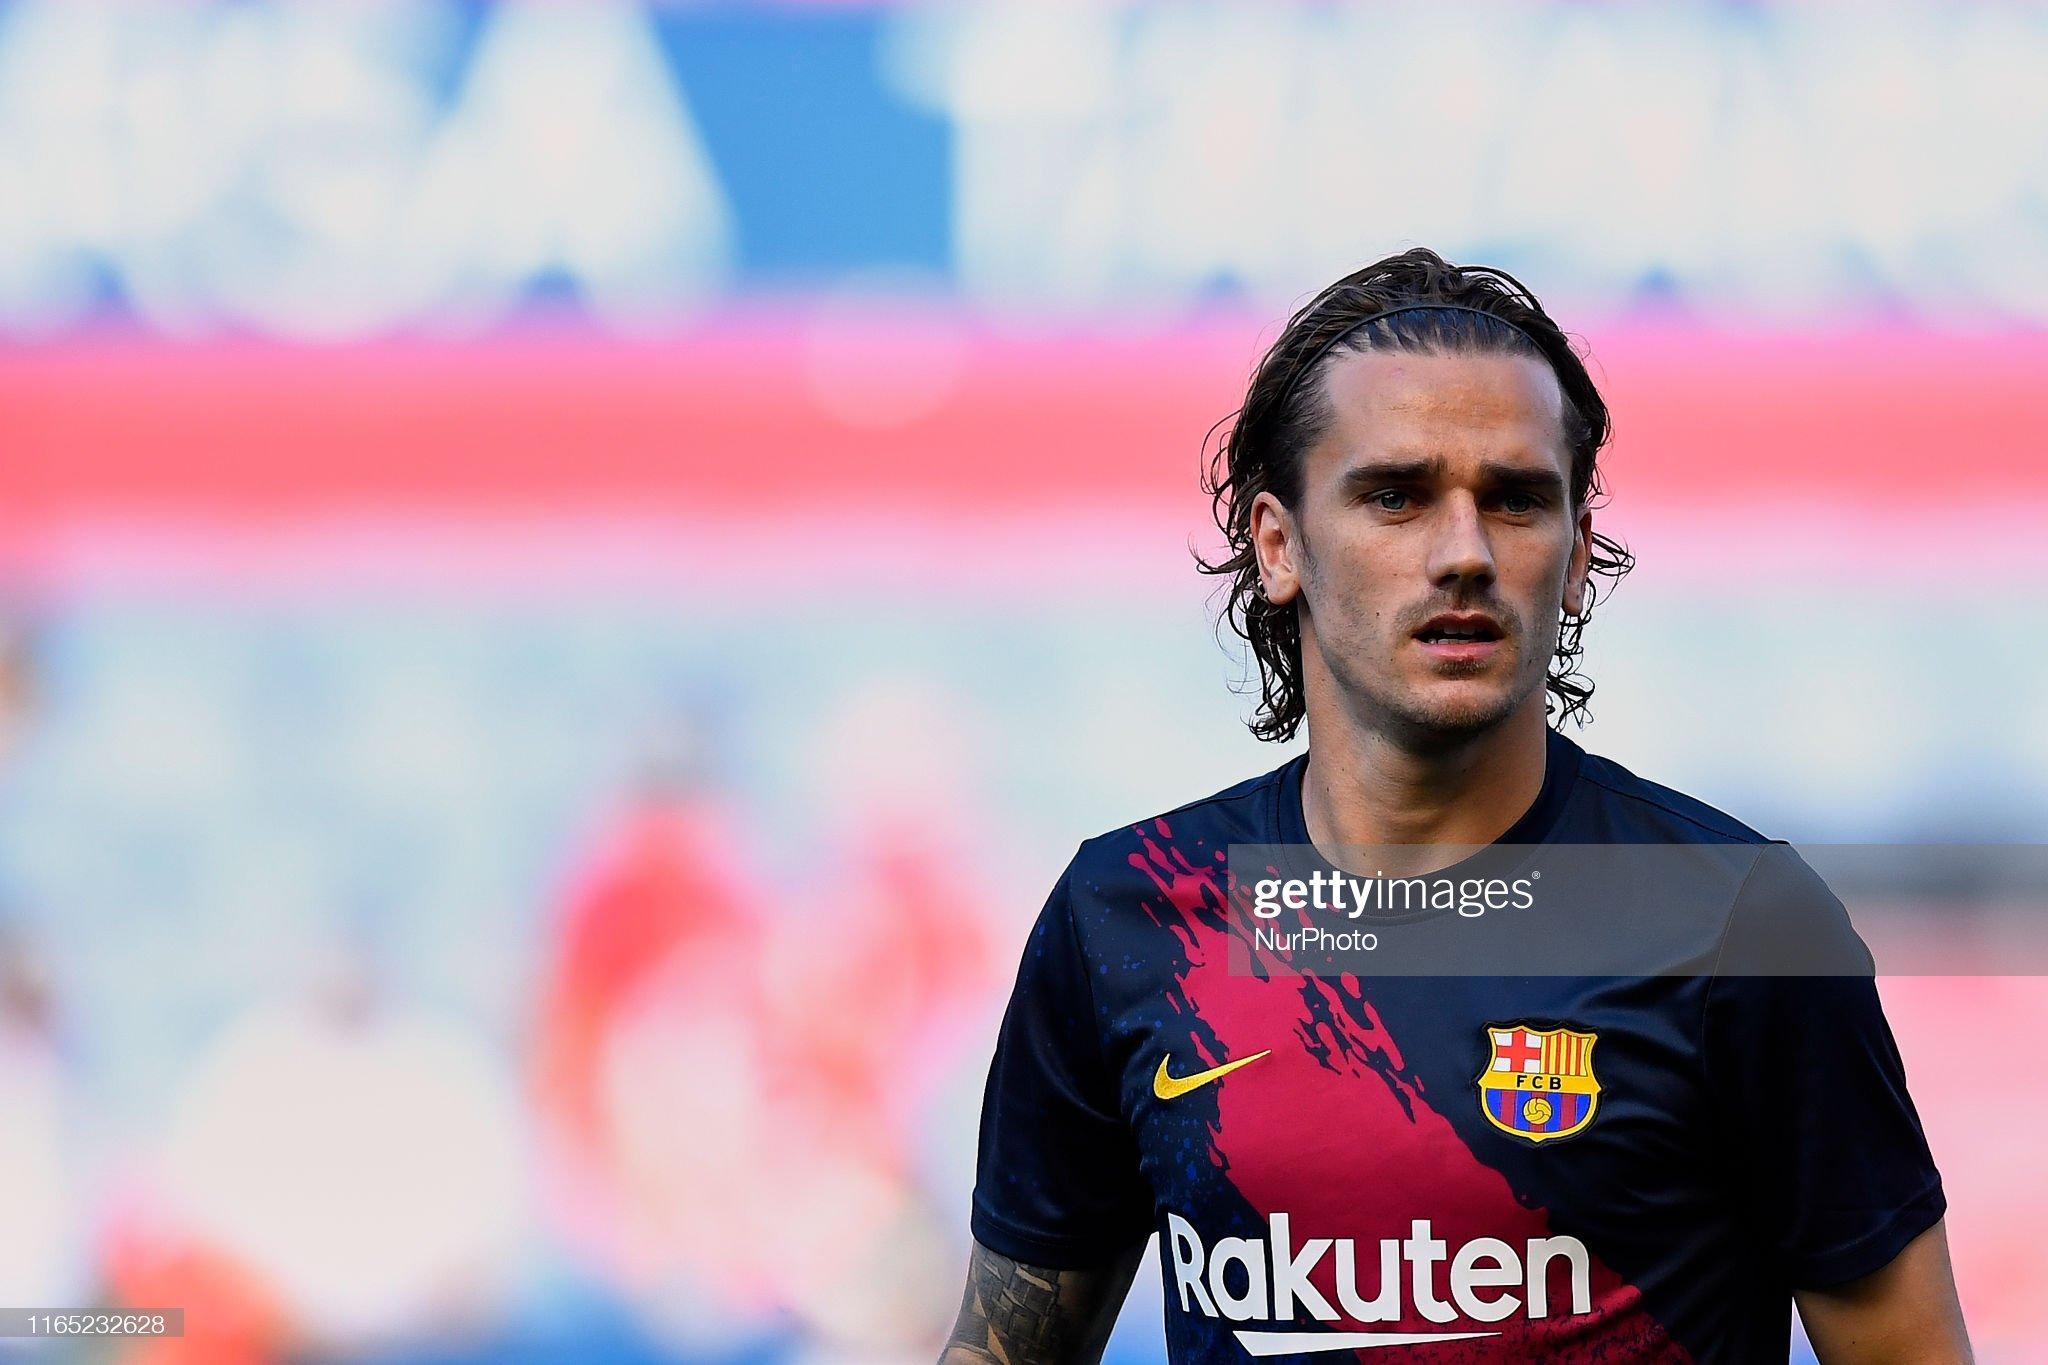 صور مباراة : أوساسونا - برشلونة 2-2 ( 31-08-2019 )  Antoine-griezmann-of-barcelona-during-the-warmup-before-the-liga-ca-picture-id1165232628?s=2048x2048